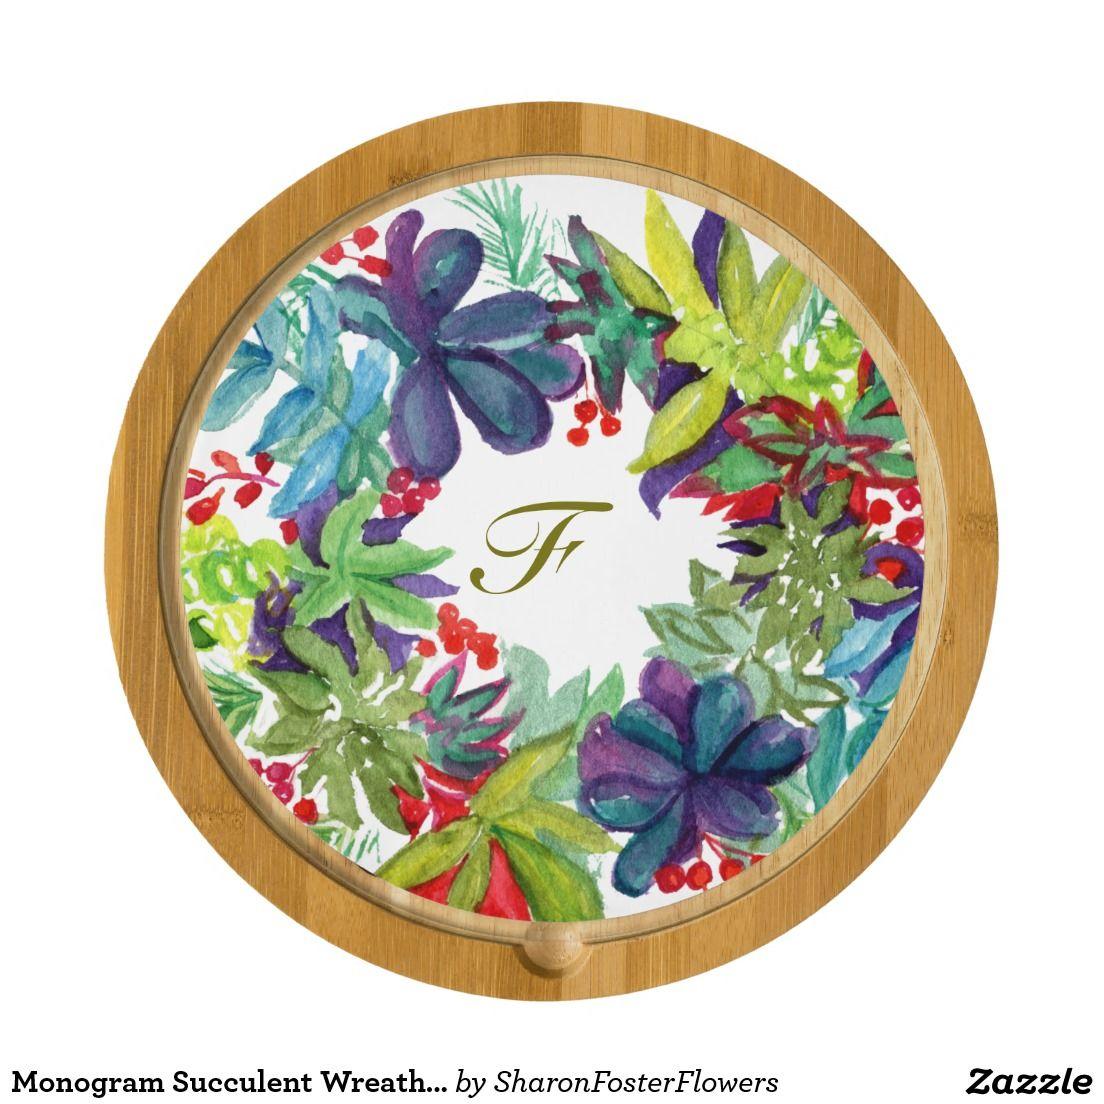 Monogram Succulent Wreath Cheeseboard